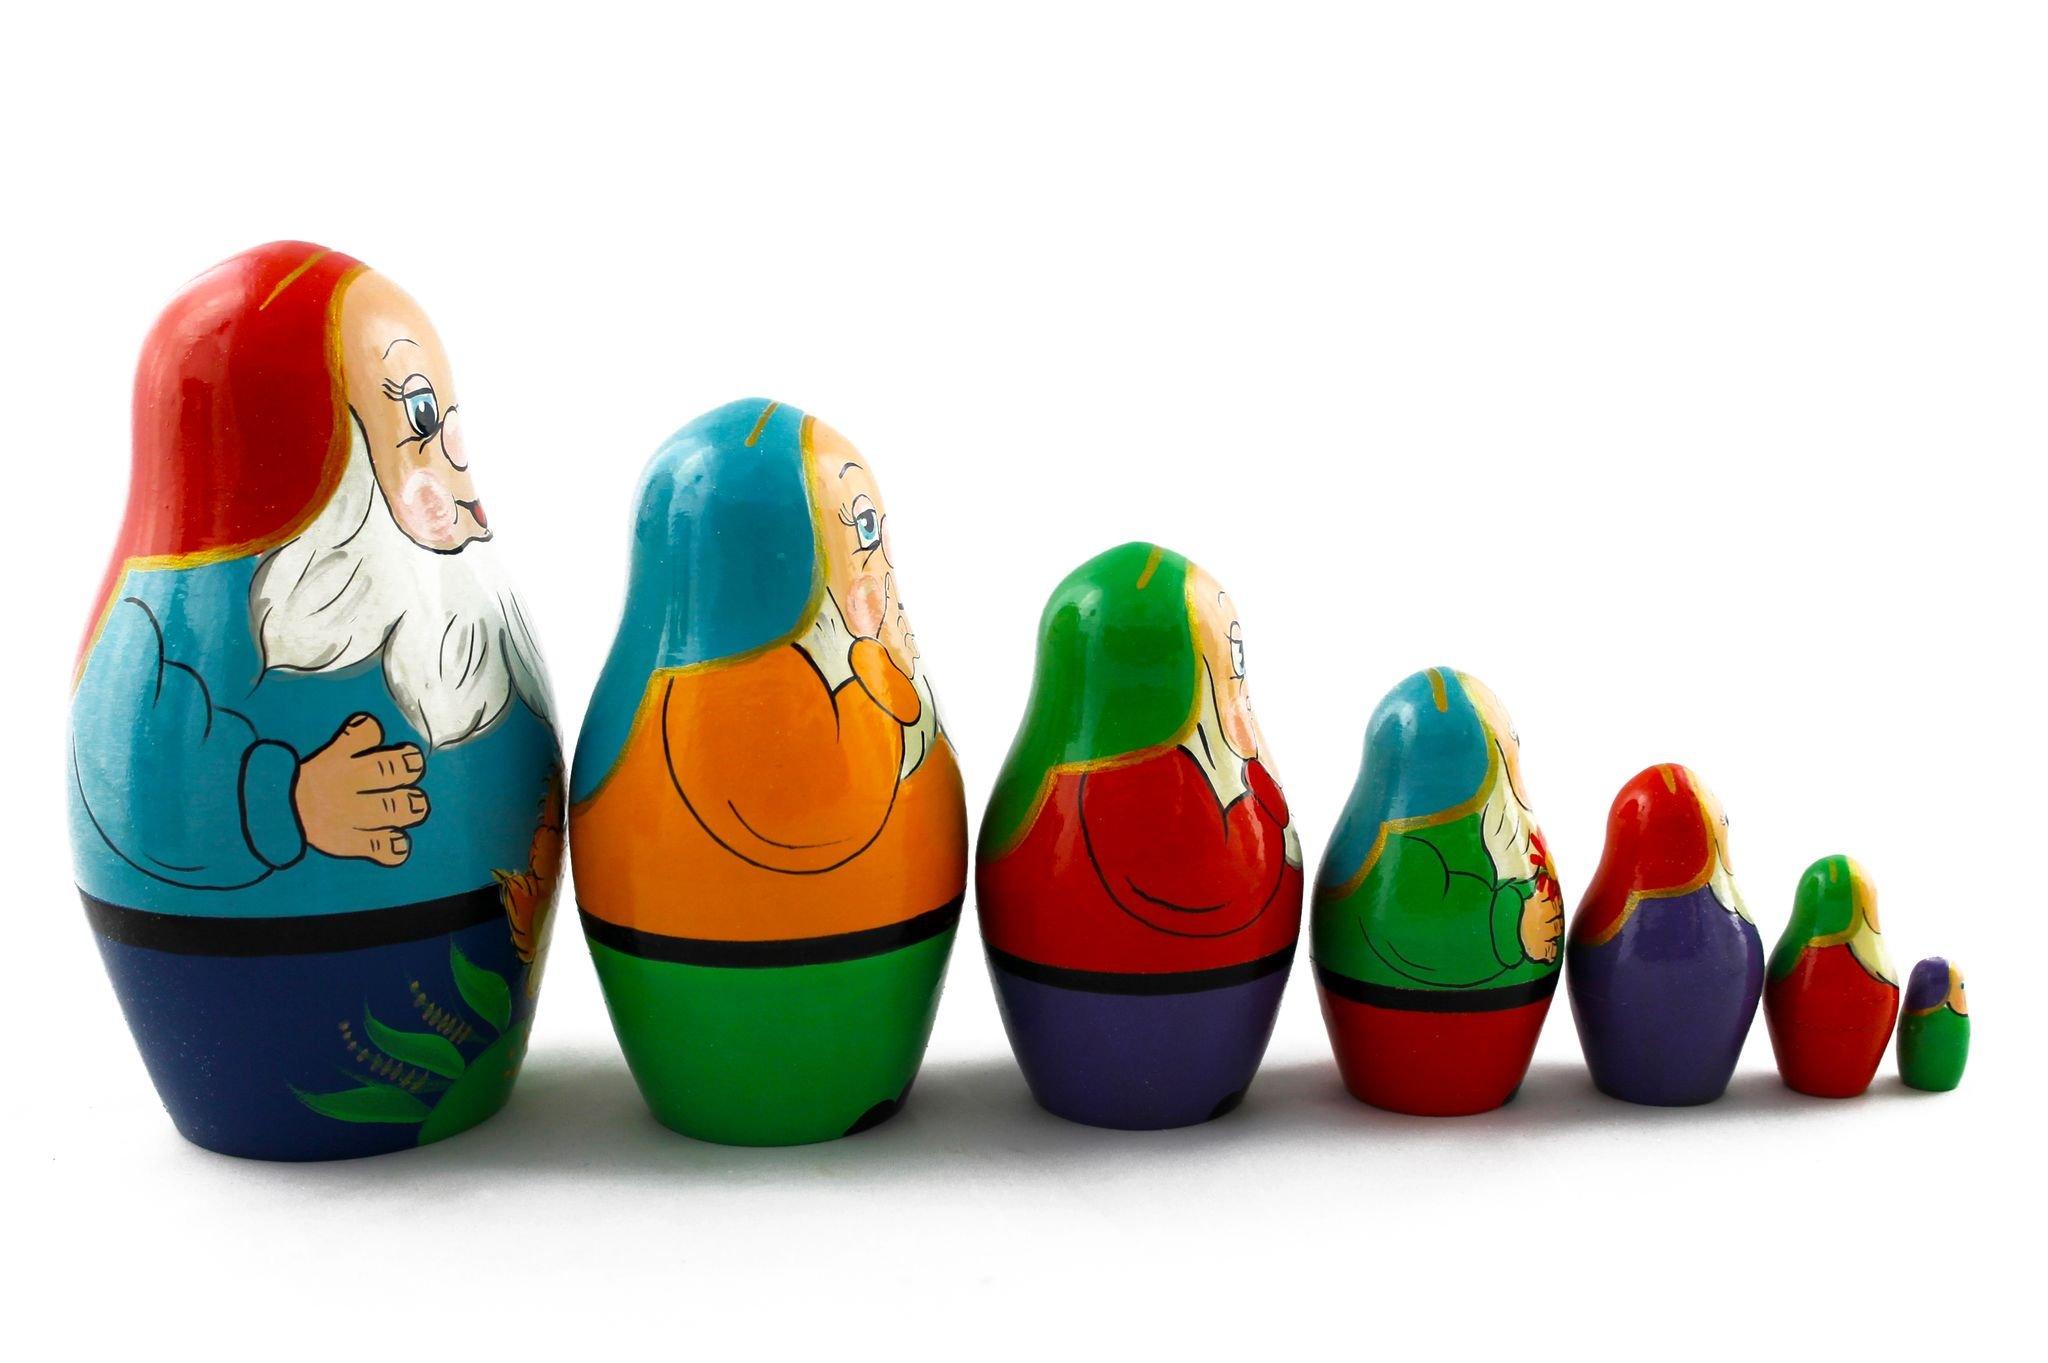 Matryoshka Russian Nesting Doll Babushka Beautiful Dwarf Seven Dwarfs Set 7 Pieces Pcs Hand Painted Handmade Souvenir Gift Handicraft by MATRYOSHKA&HANDICRAFT (Image #2)